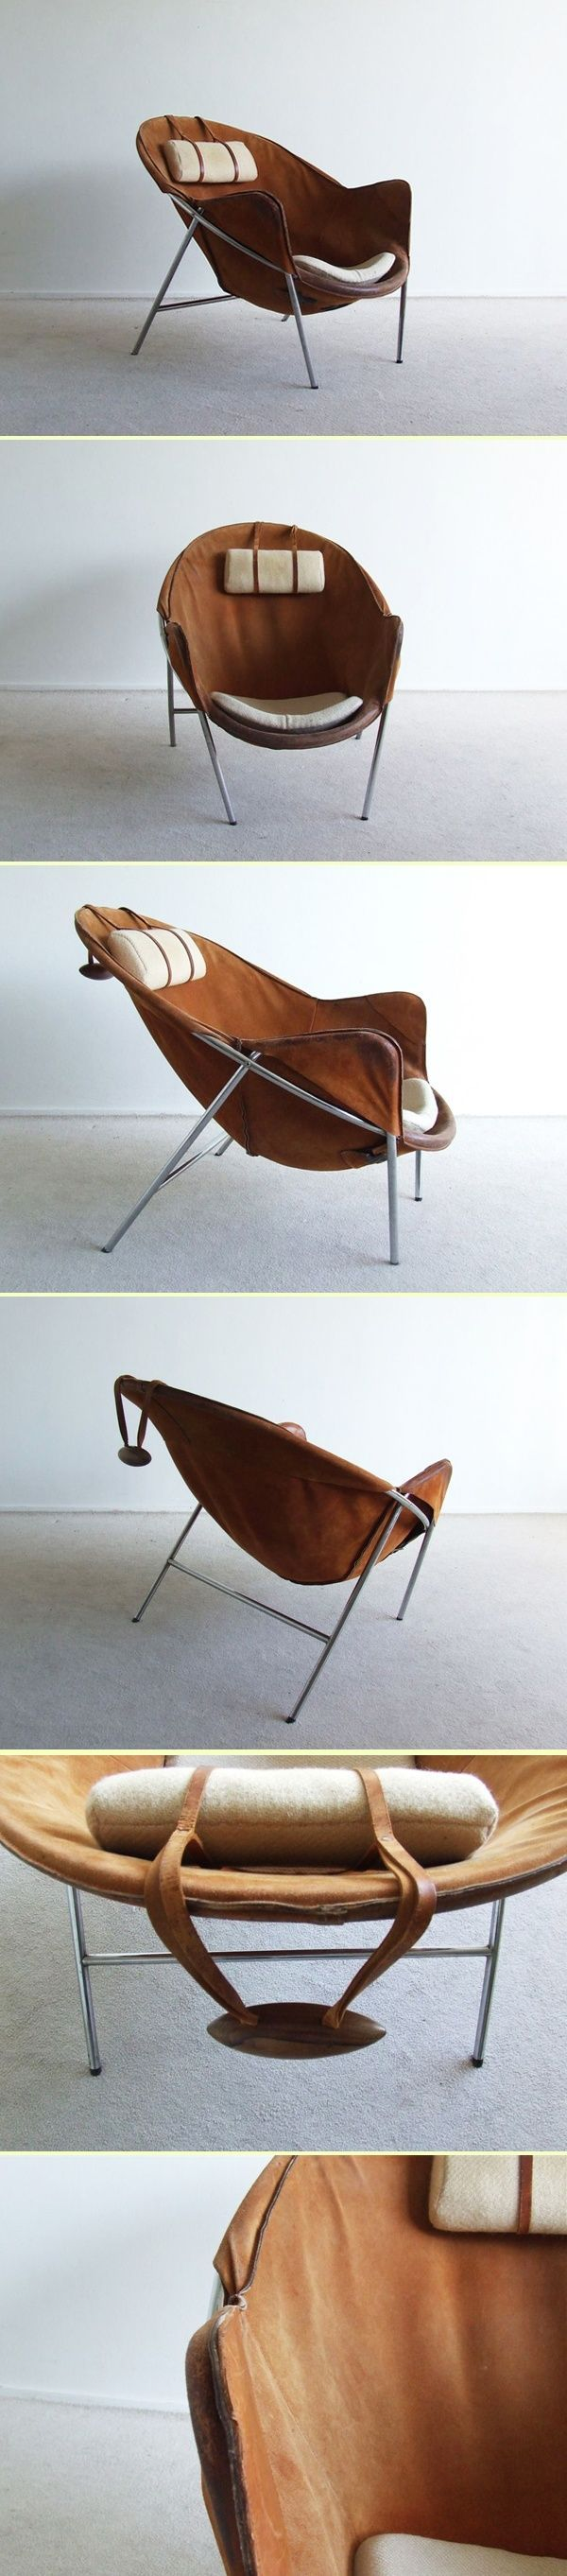 #Seat